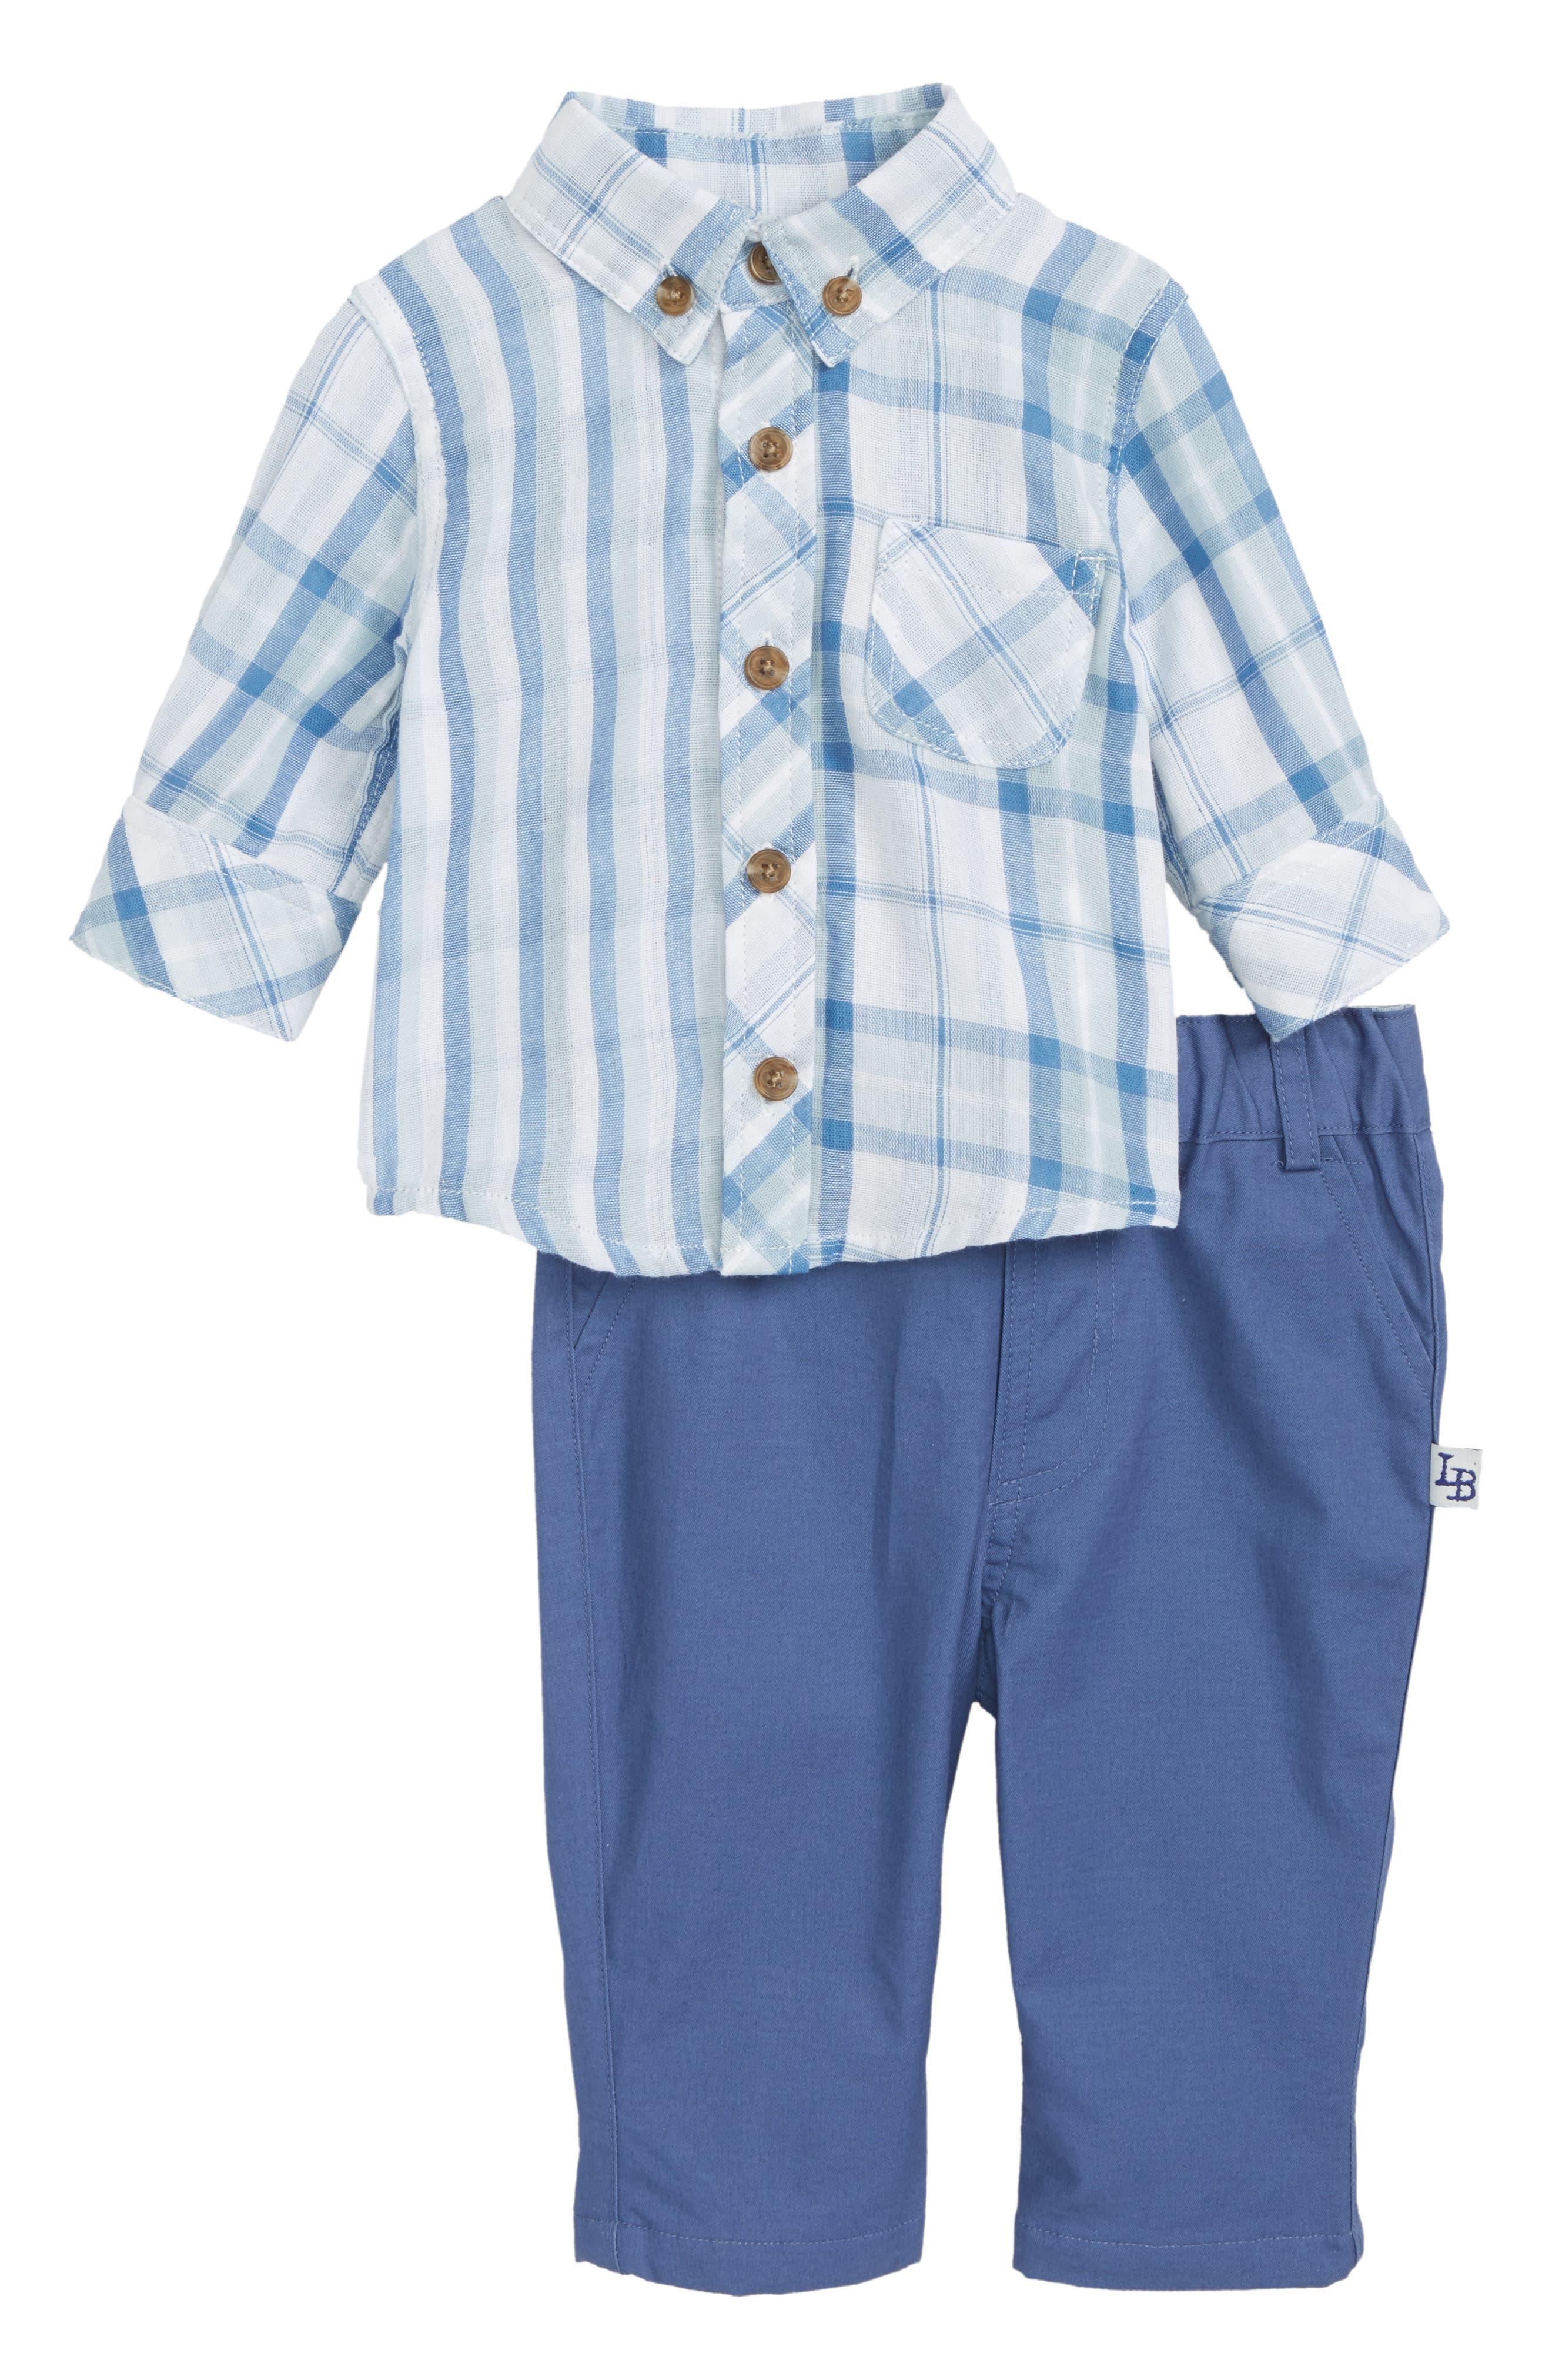 Mixed Plaid Top & Pants Set,                             Main thumbnail 1, color,                             Blue